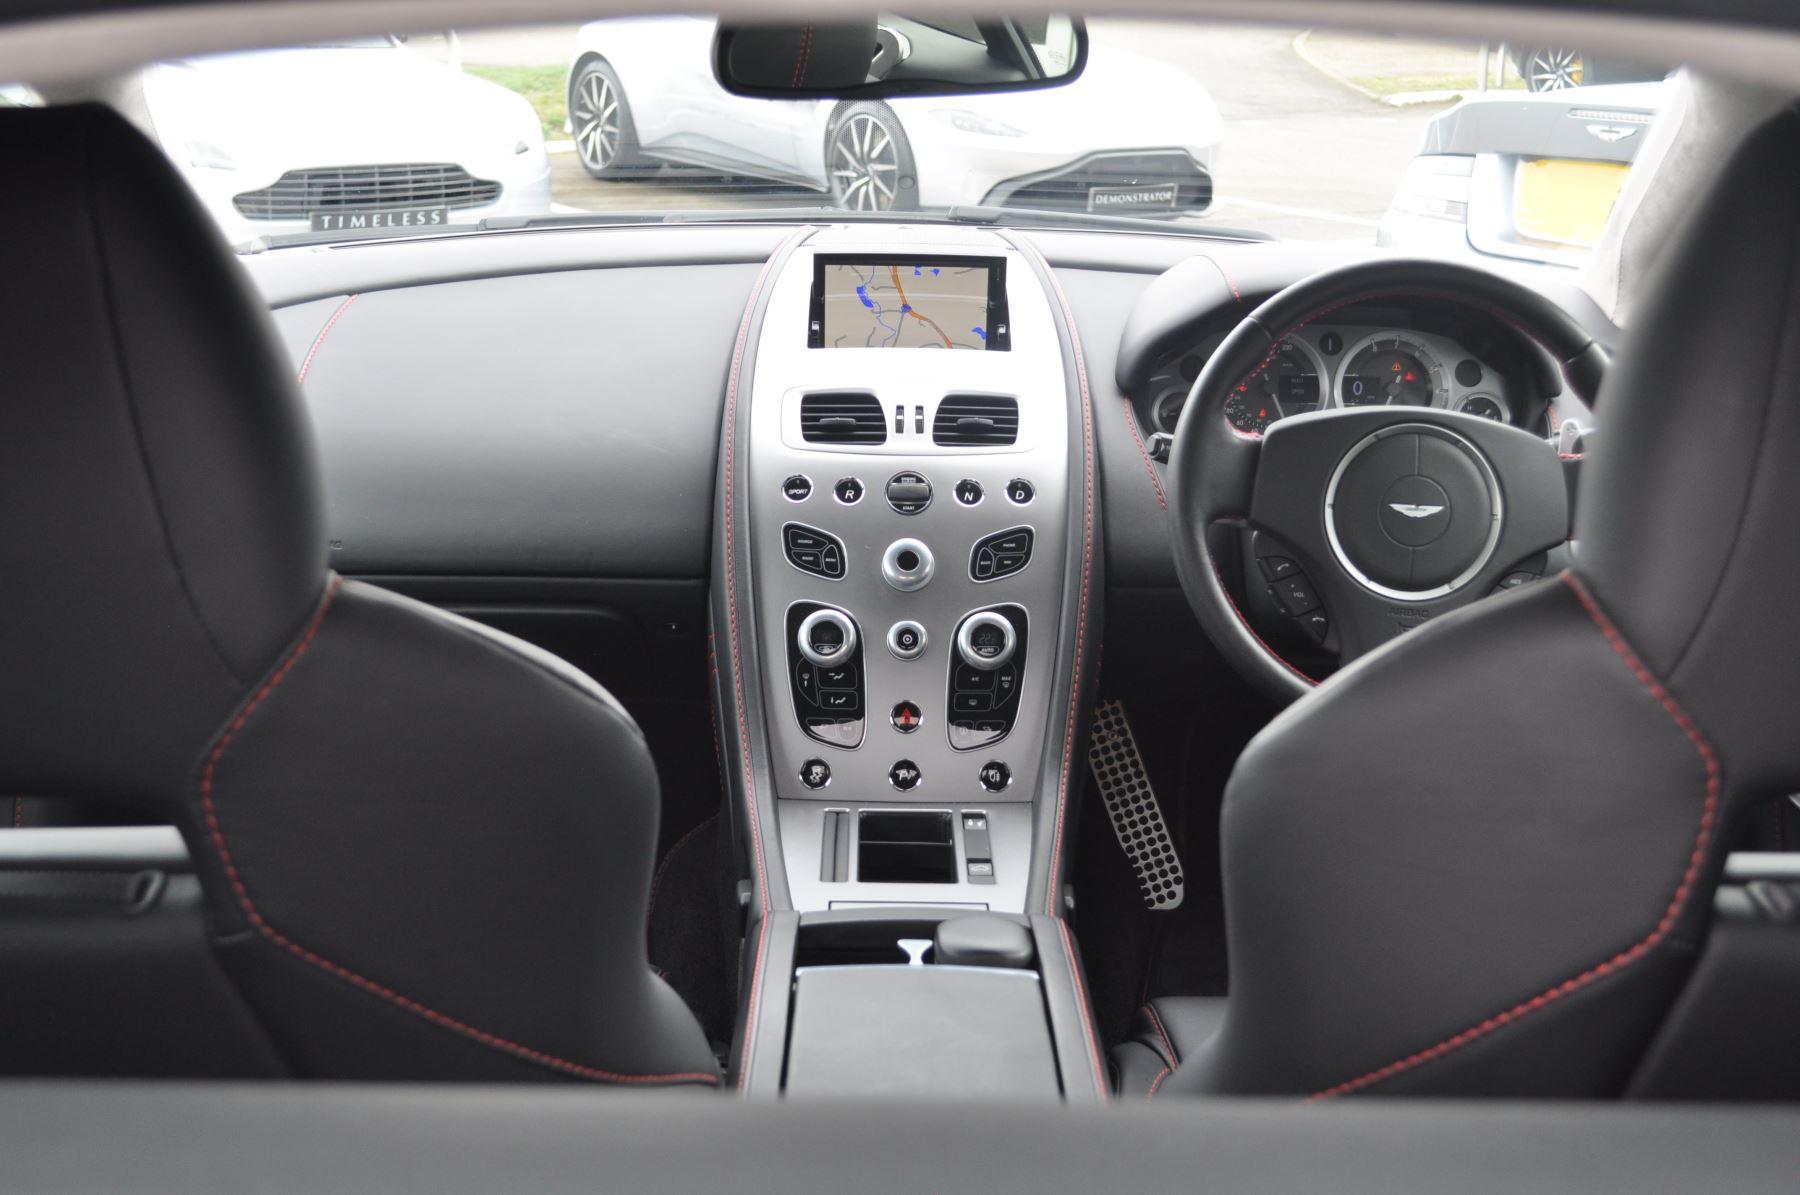 Aston Martin V8 Vantage S Coupe Coupe image 37